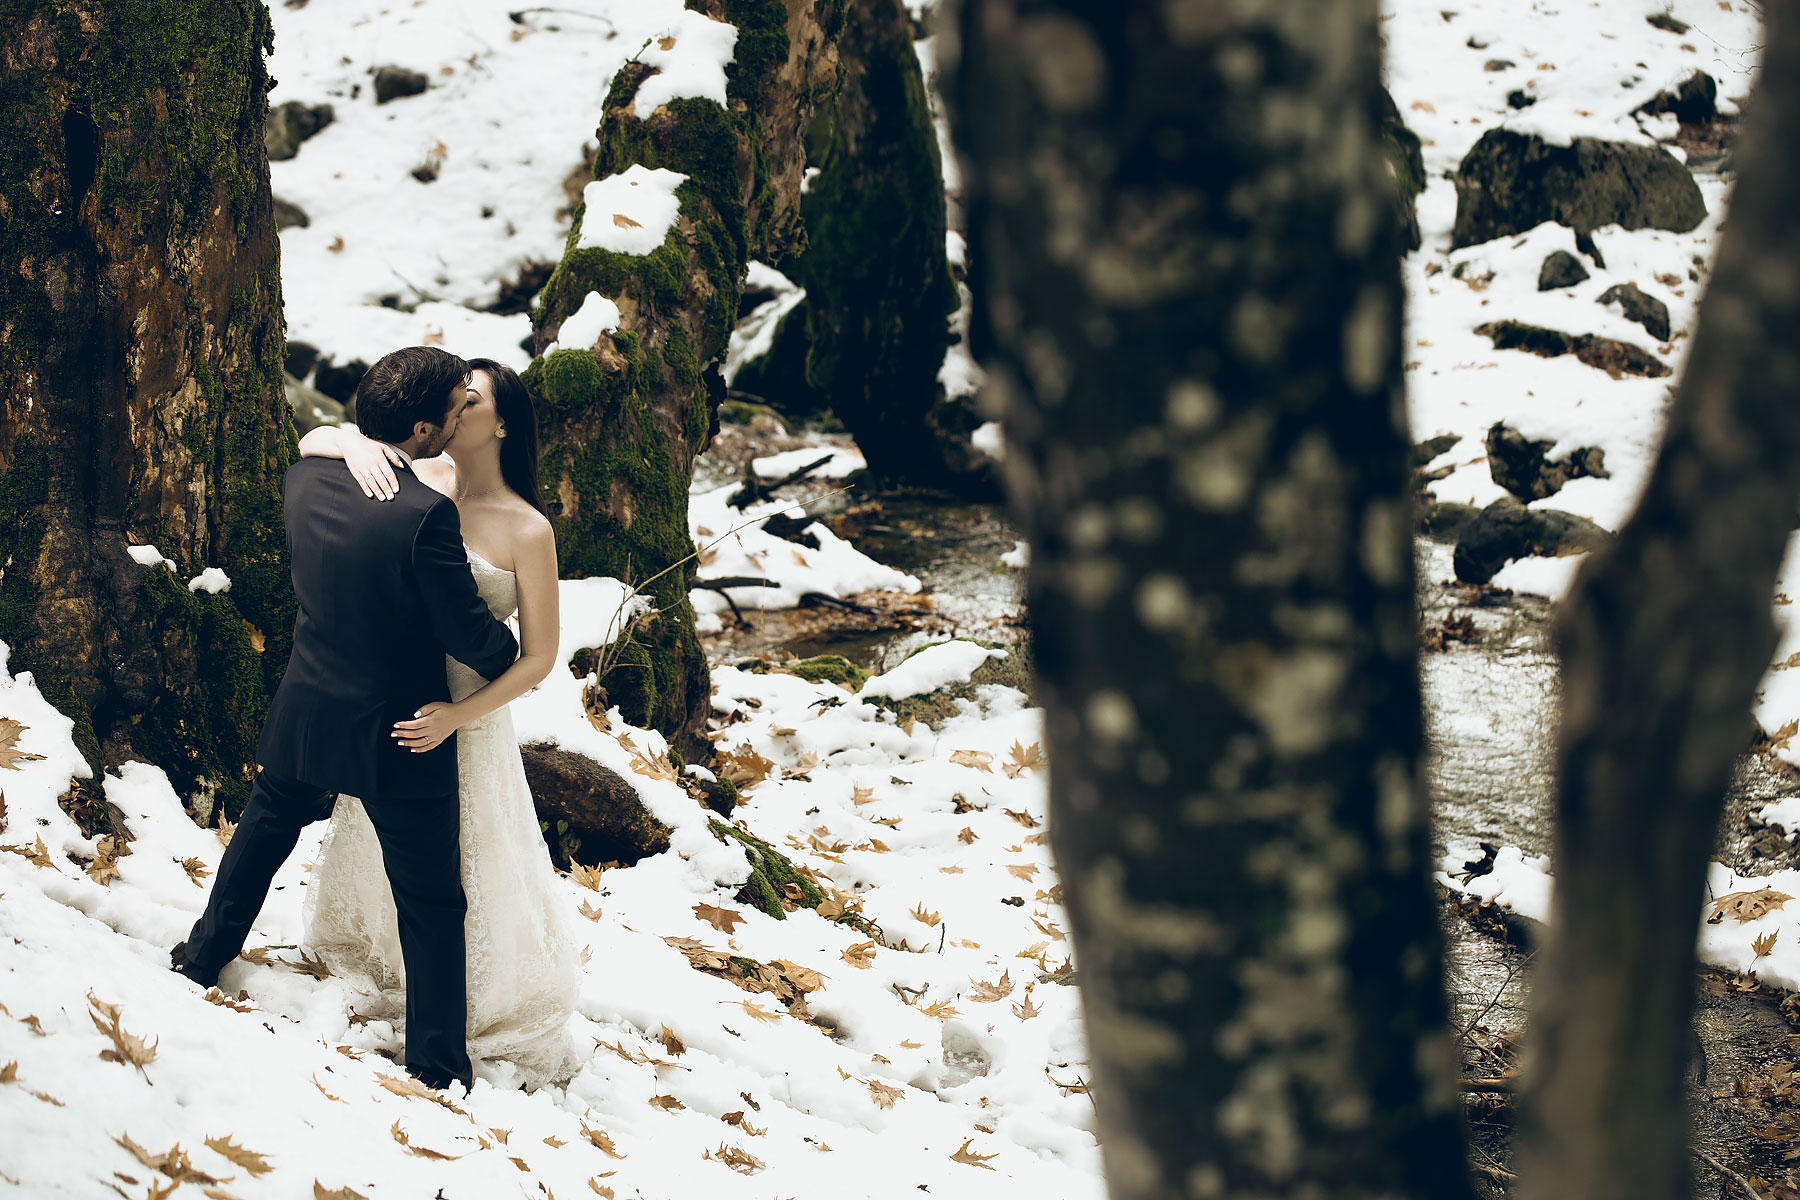 e6e0P2Photography_wedding_greece_Dimitris_Sissy_1813.jpg